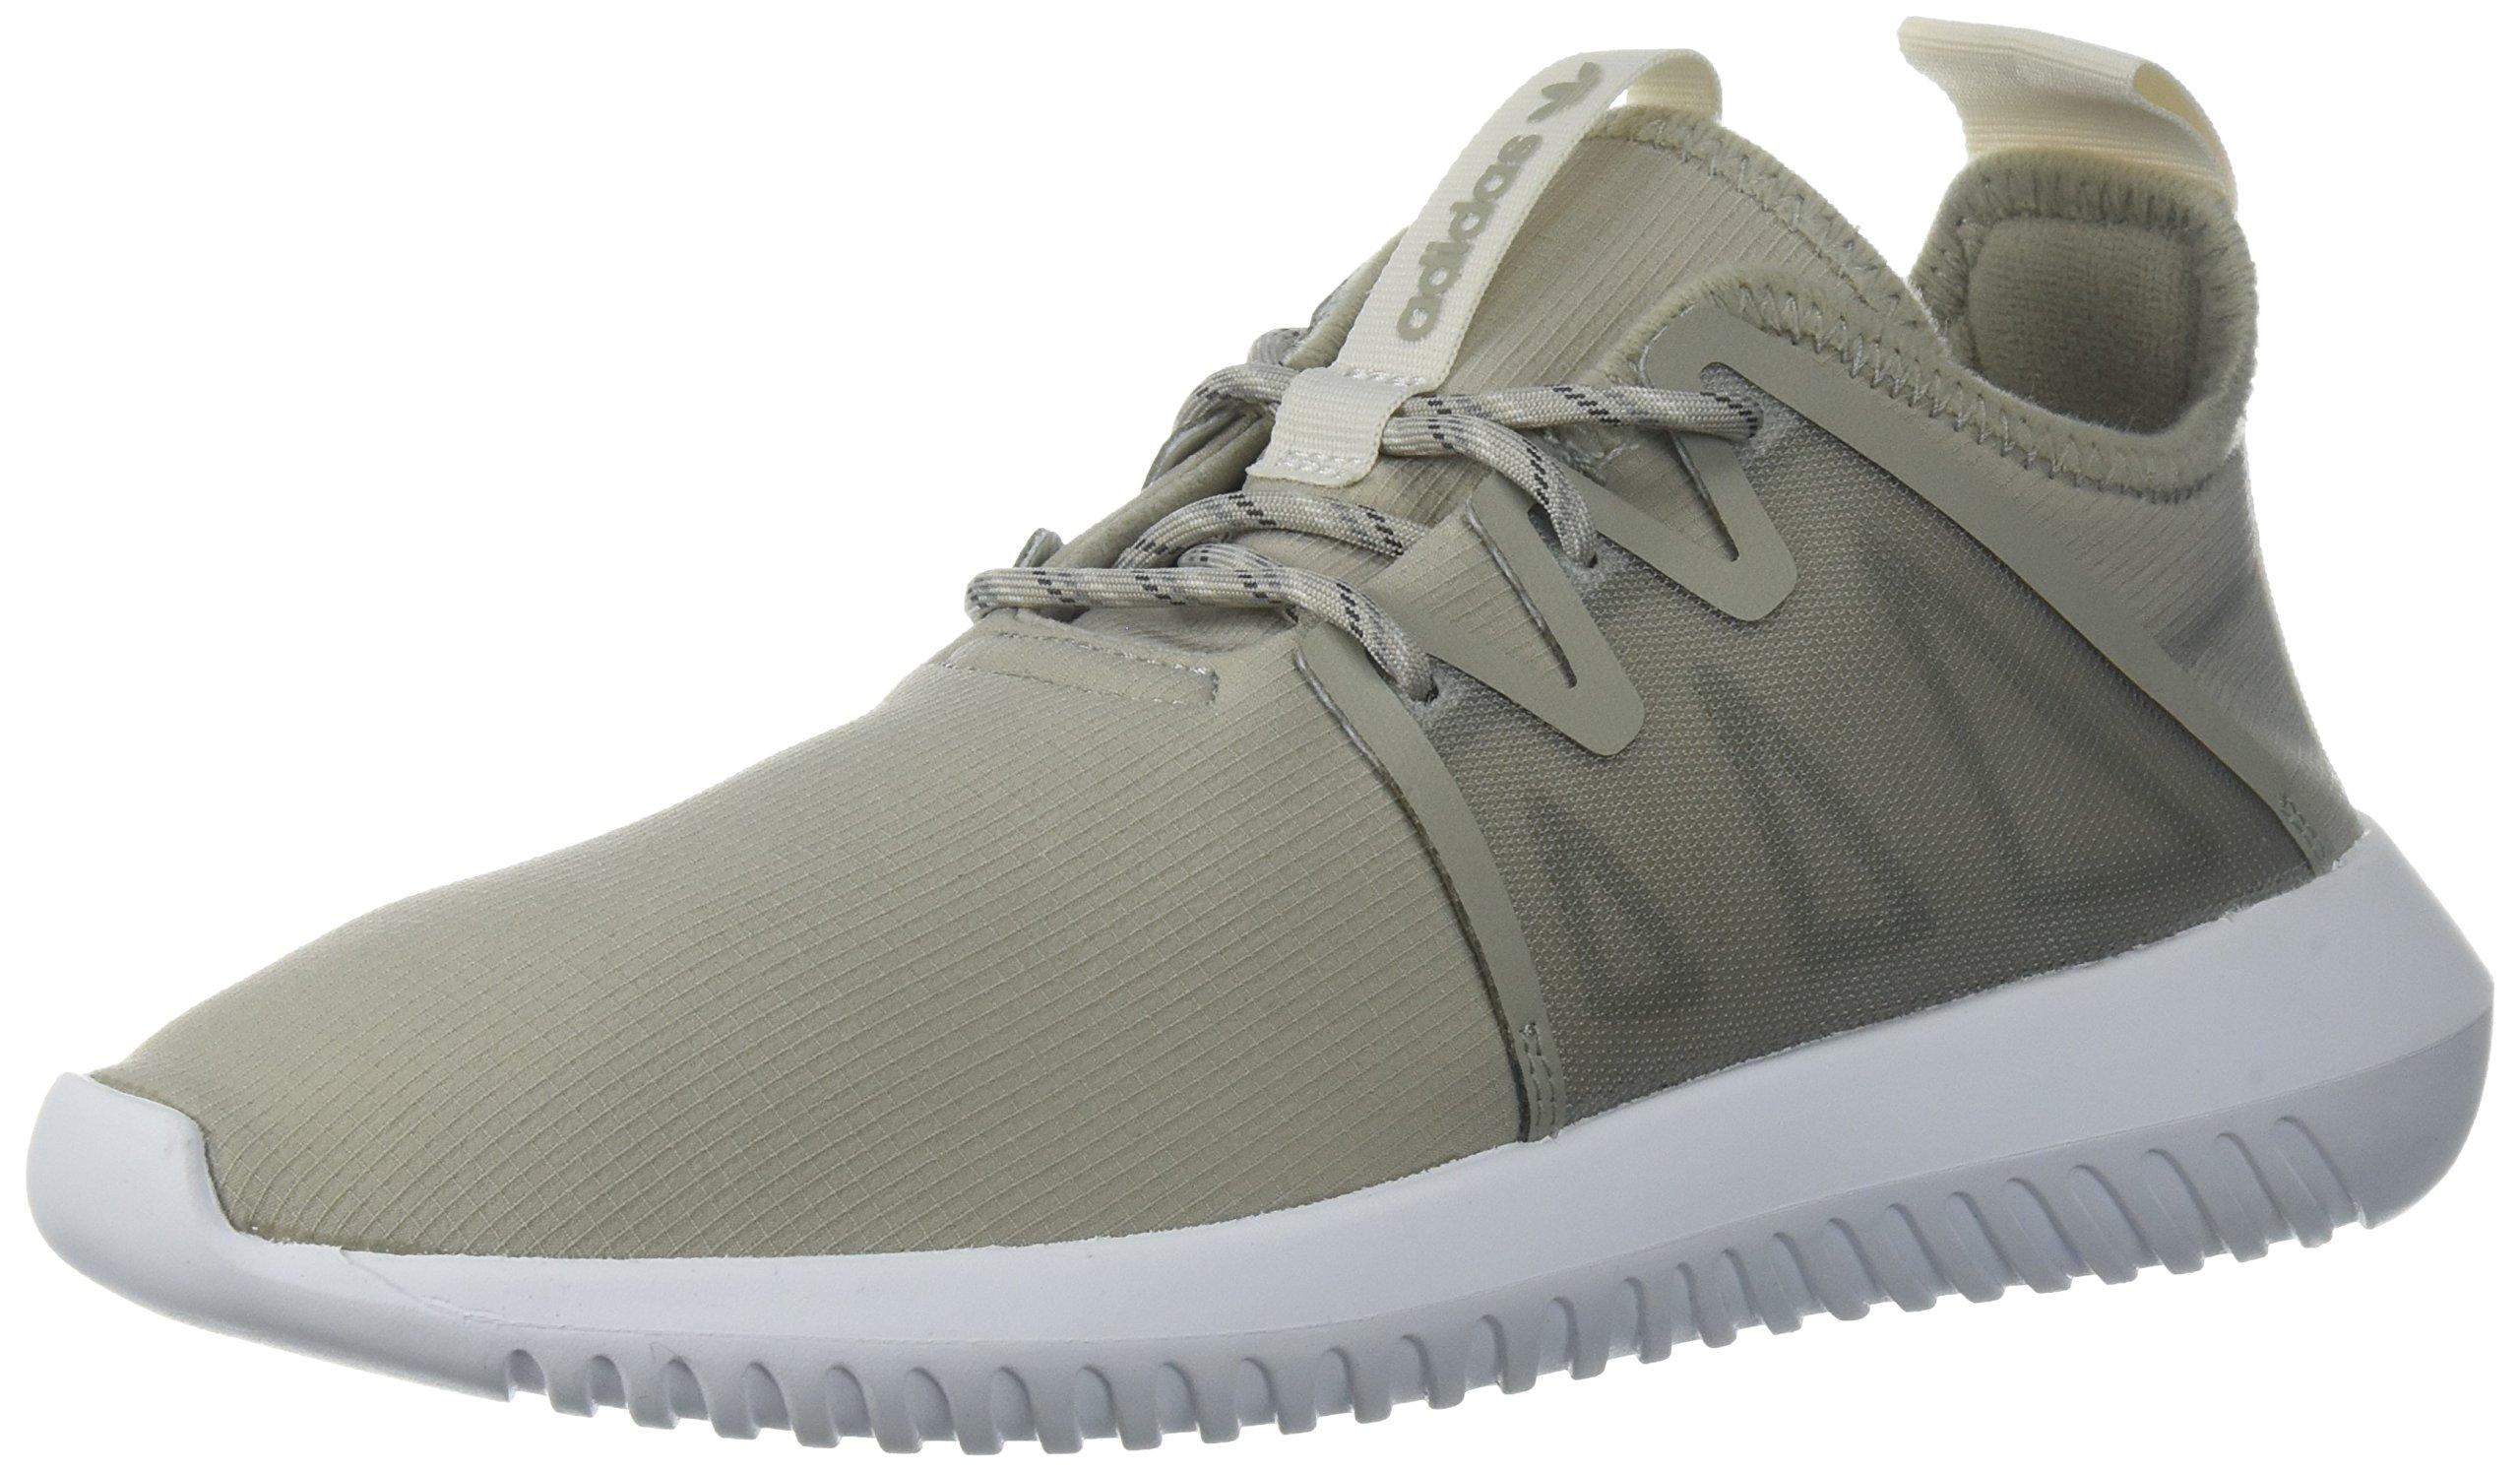 adidas Originals Women's Tubular VIRAL2 W Sneaker, Sesame/Chalk White/White, 7.5 M US